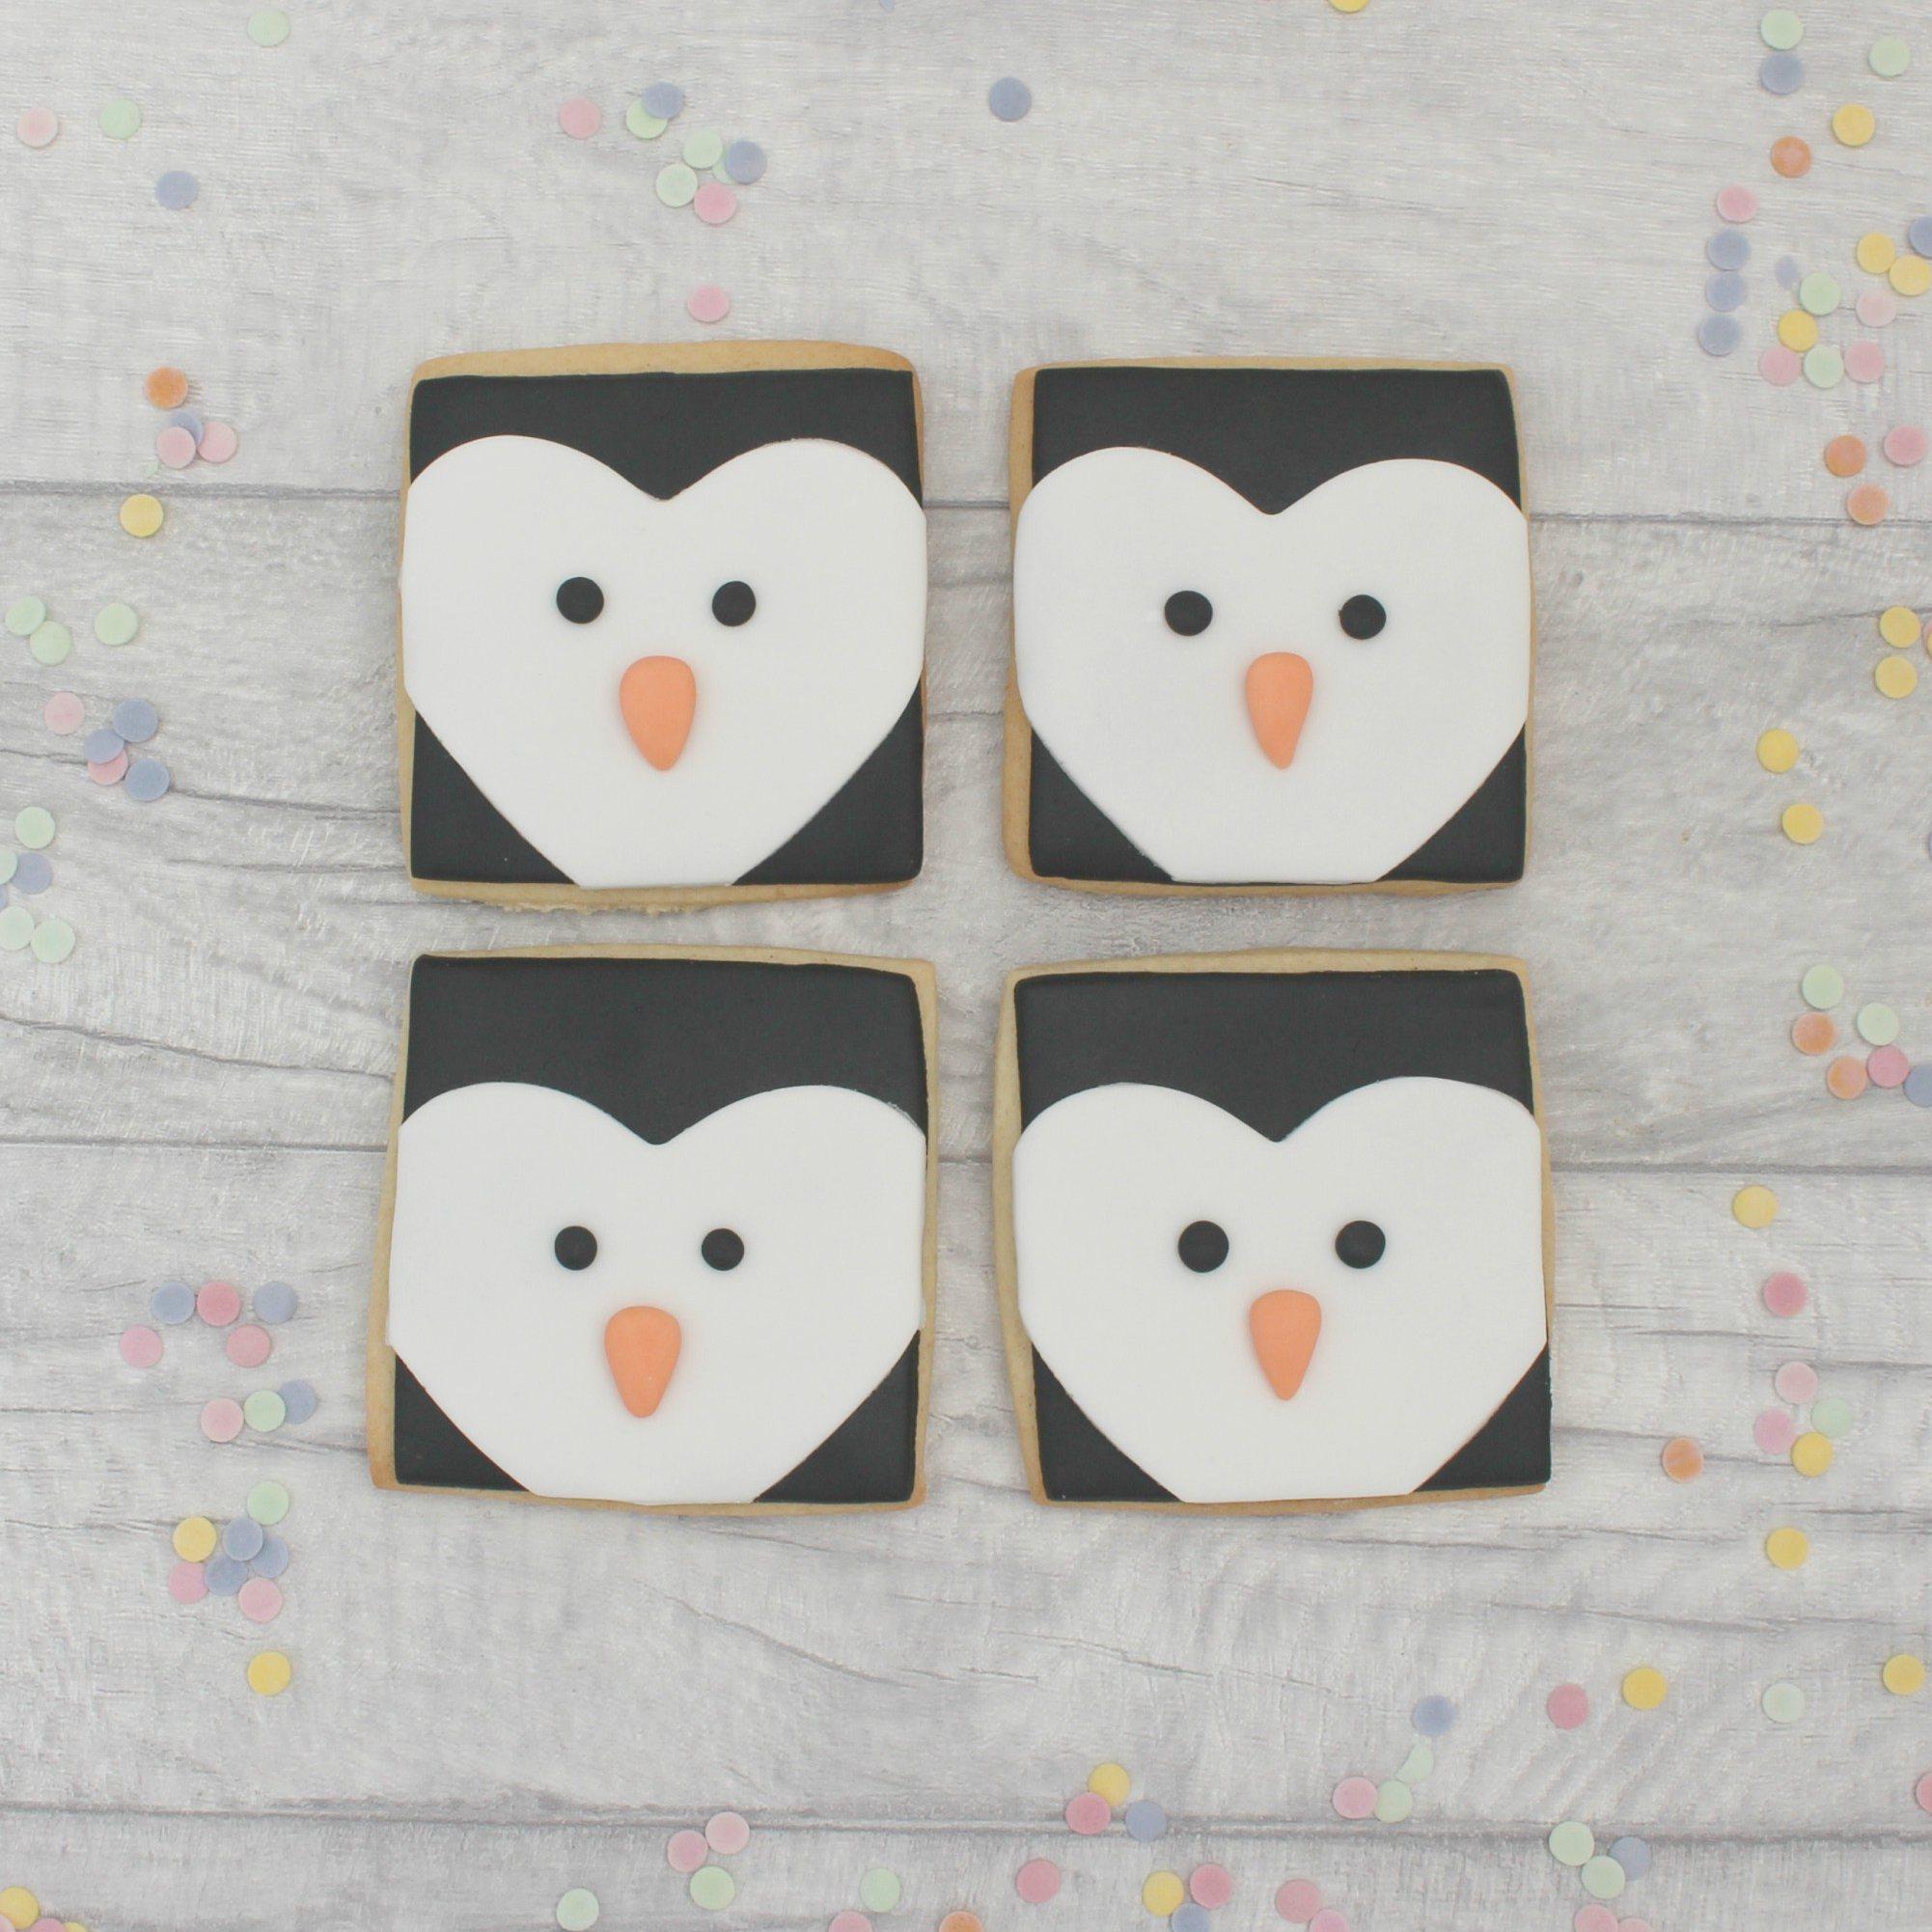 Penguin Cookies House Cookies